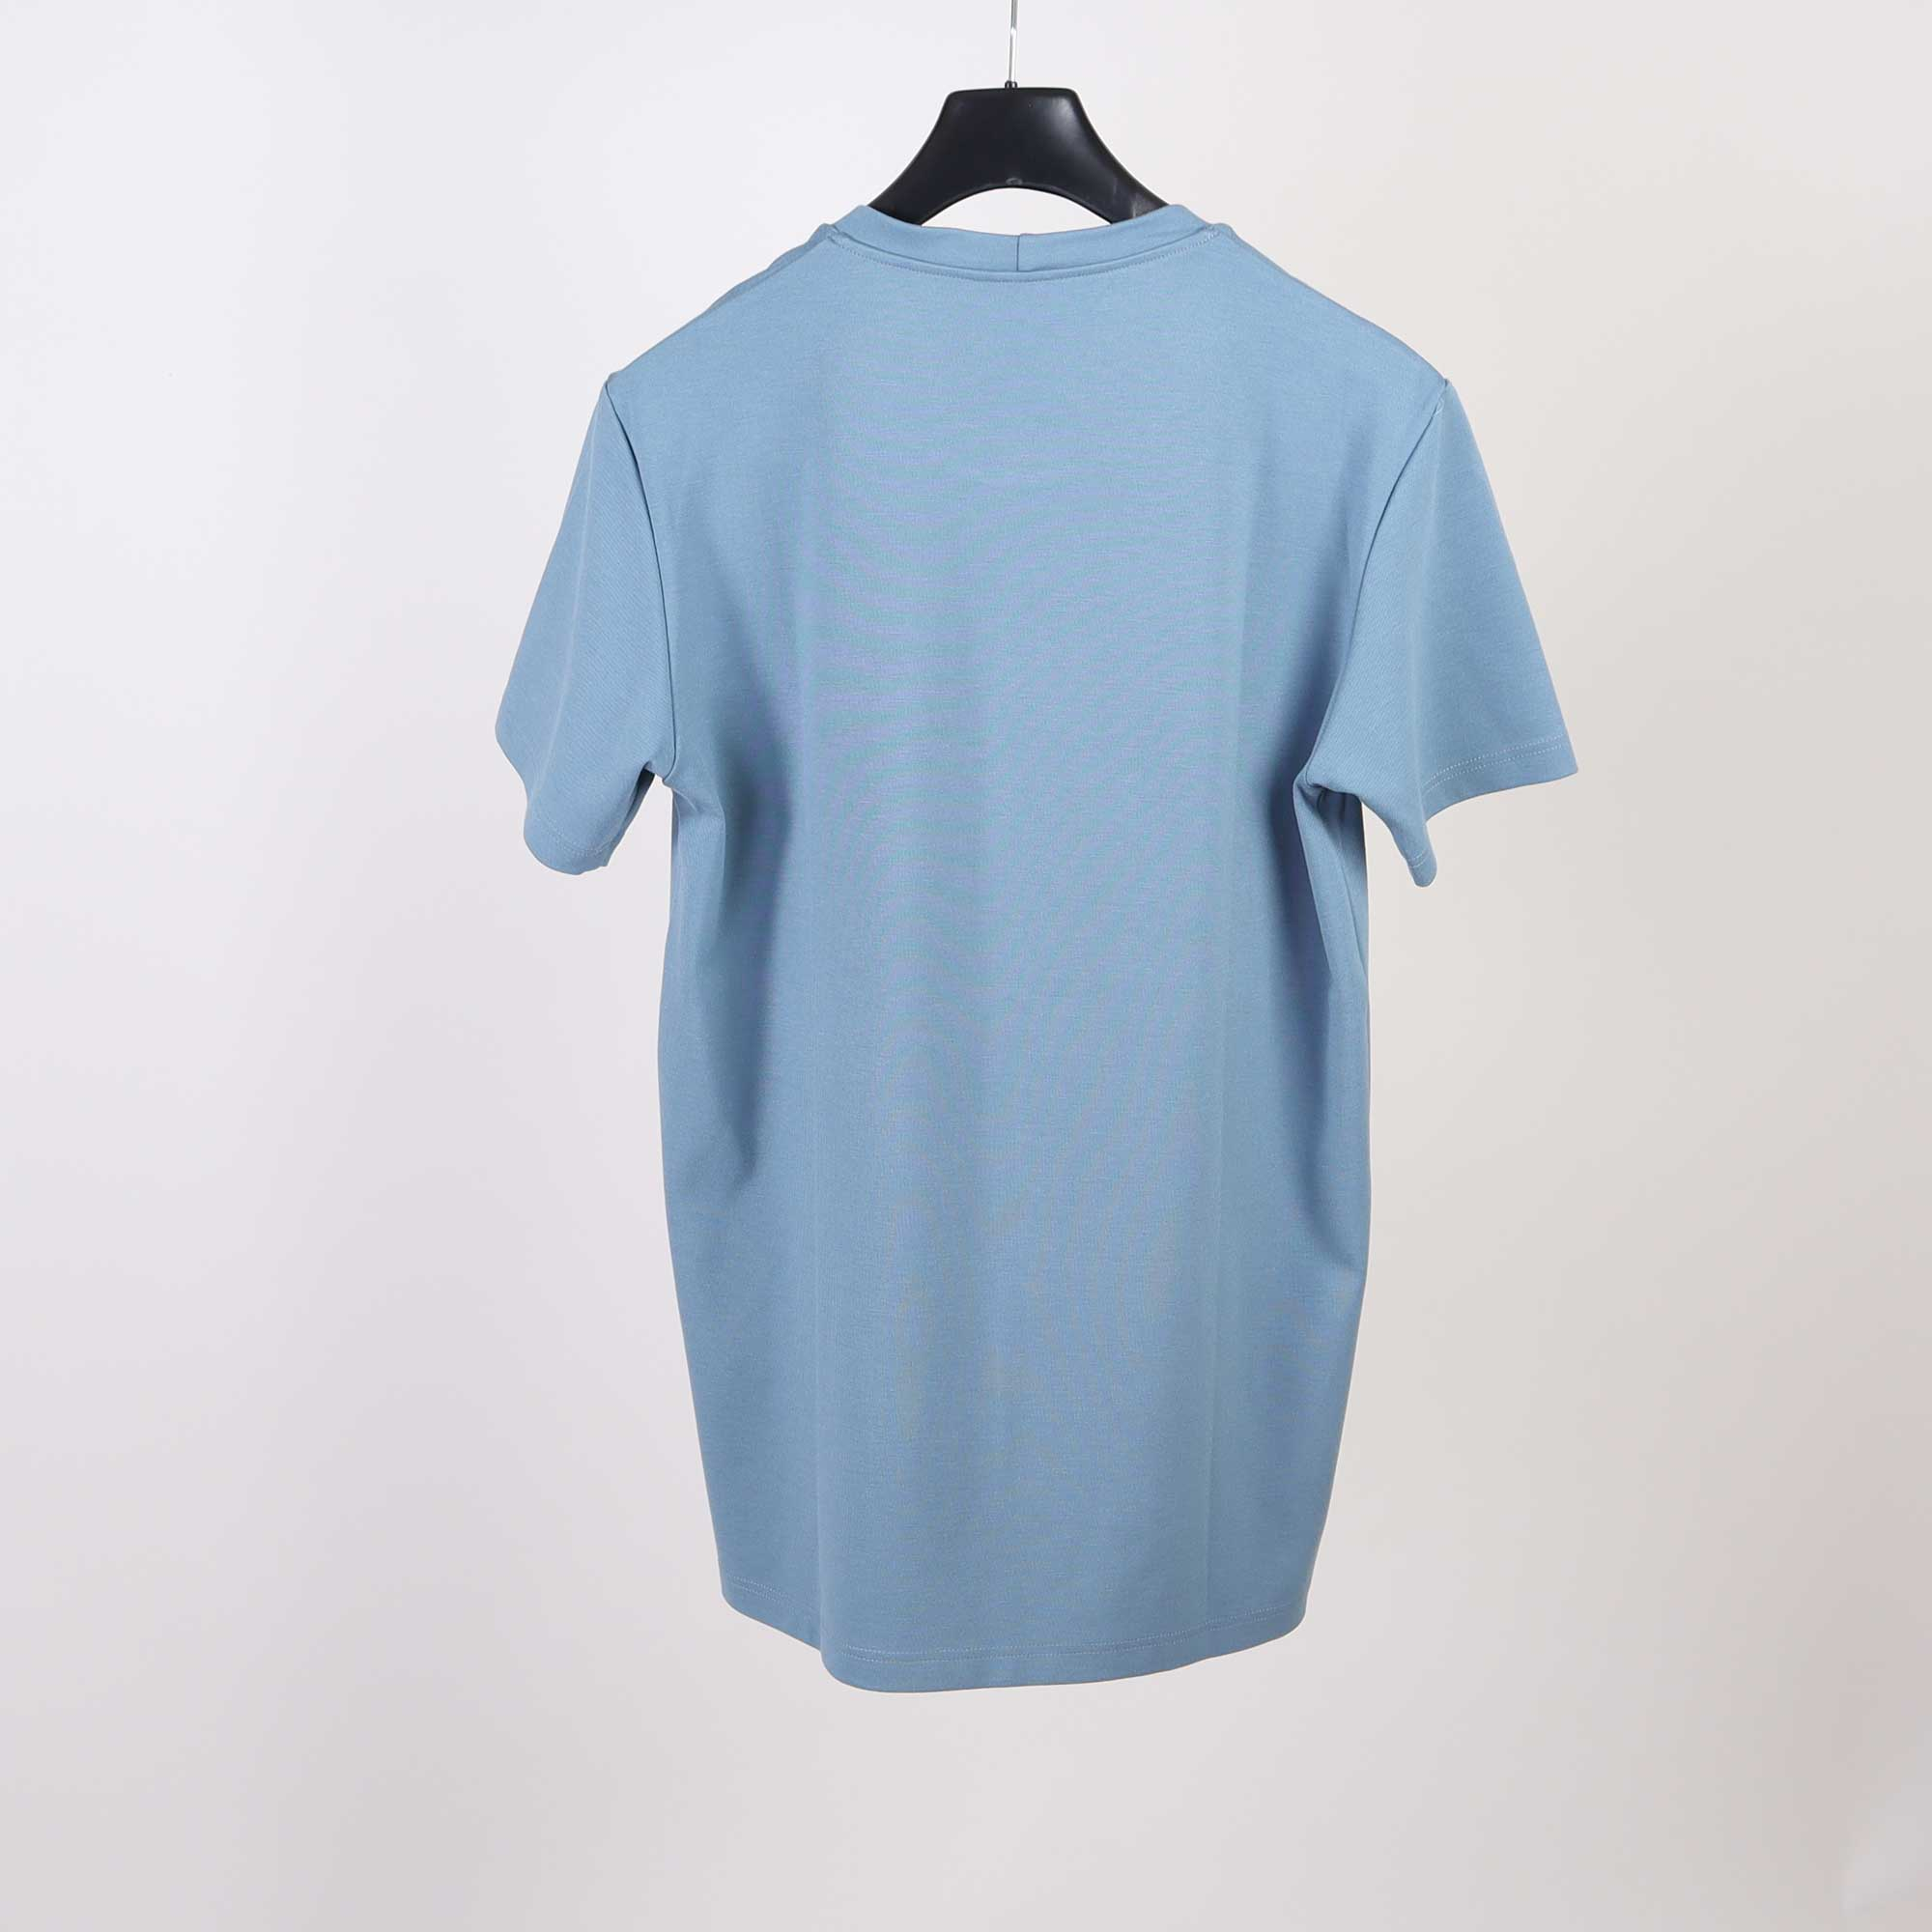 punto-tee-licht-blauw-product-2